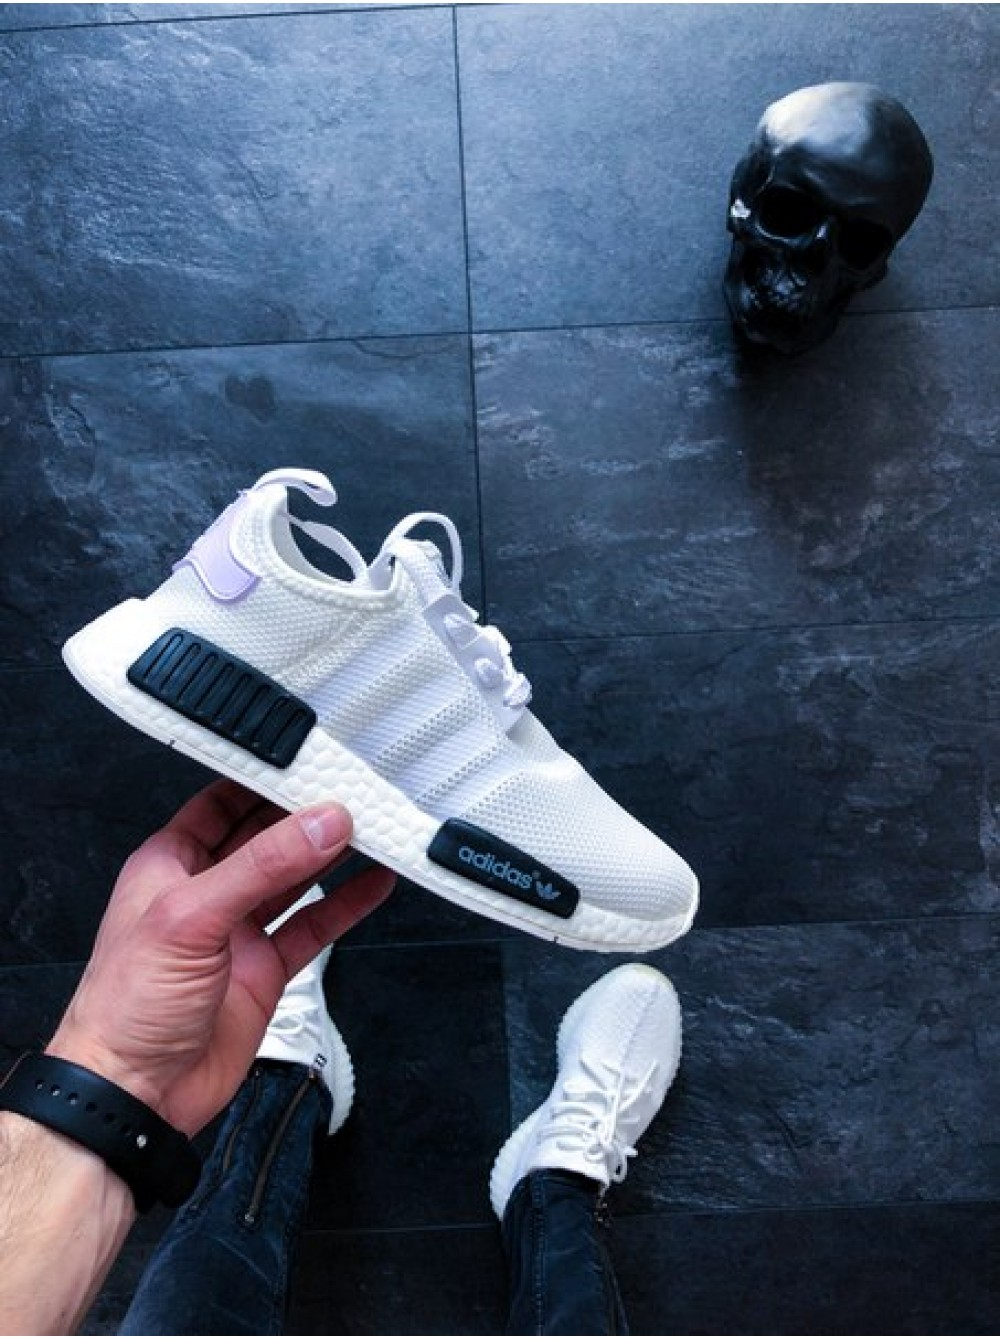 df62c94839bcae Кроссовки Adidas NMD R1 Oreo White/Core Black